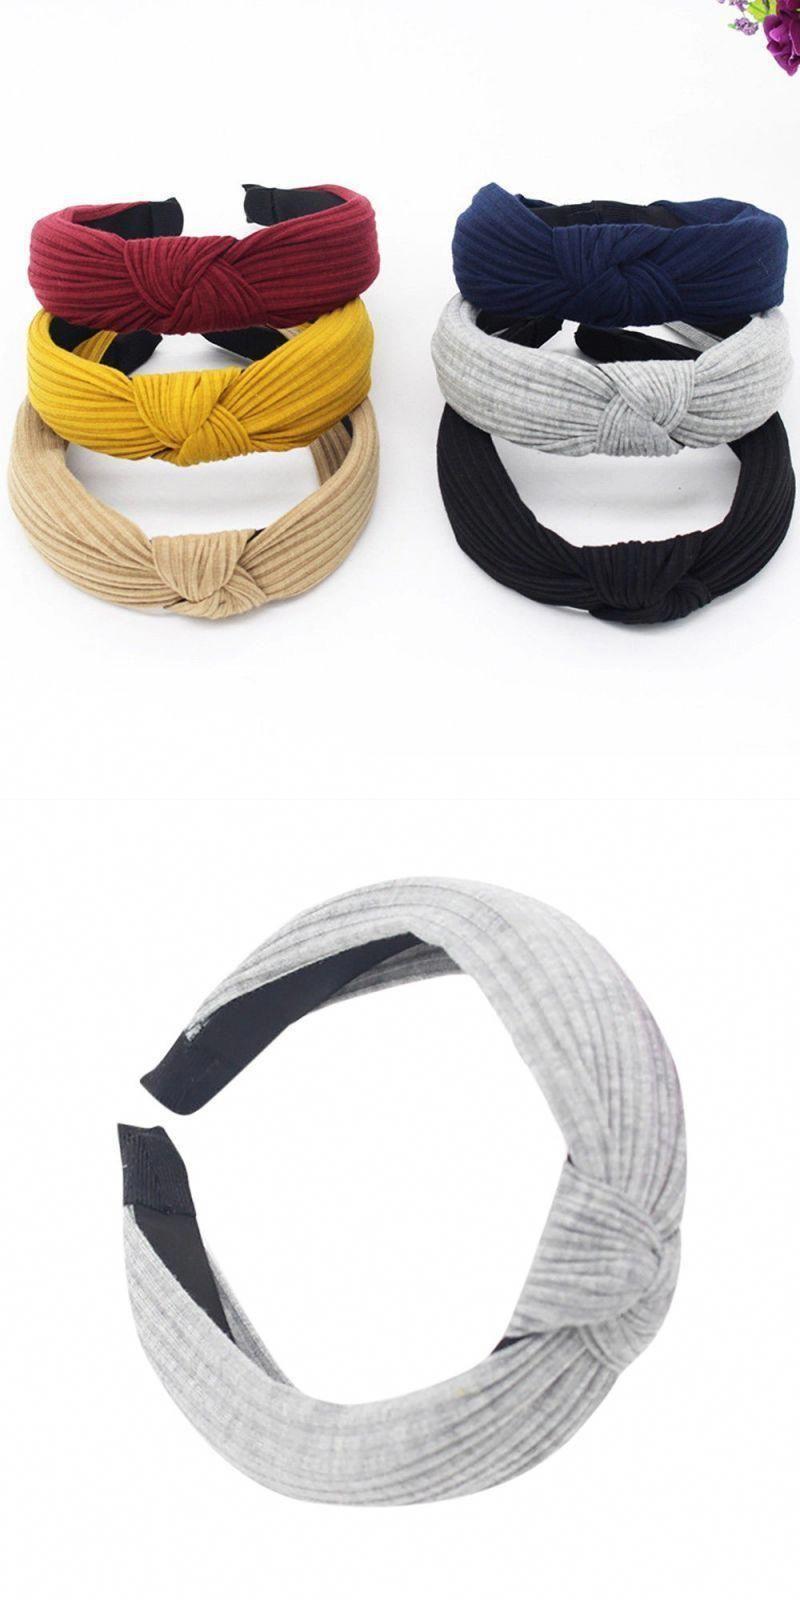 Twist Tie Cross Band Women Headwrap Hair Hoop Cloth Headband Hairband Knot Bow